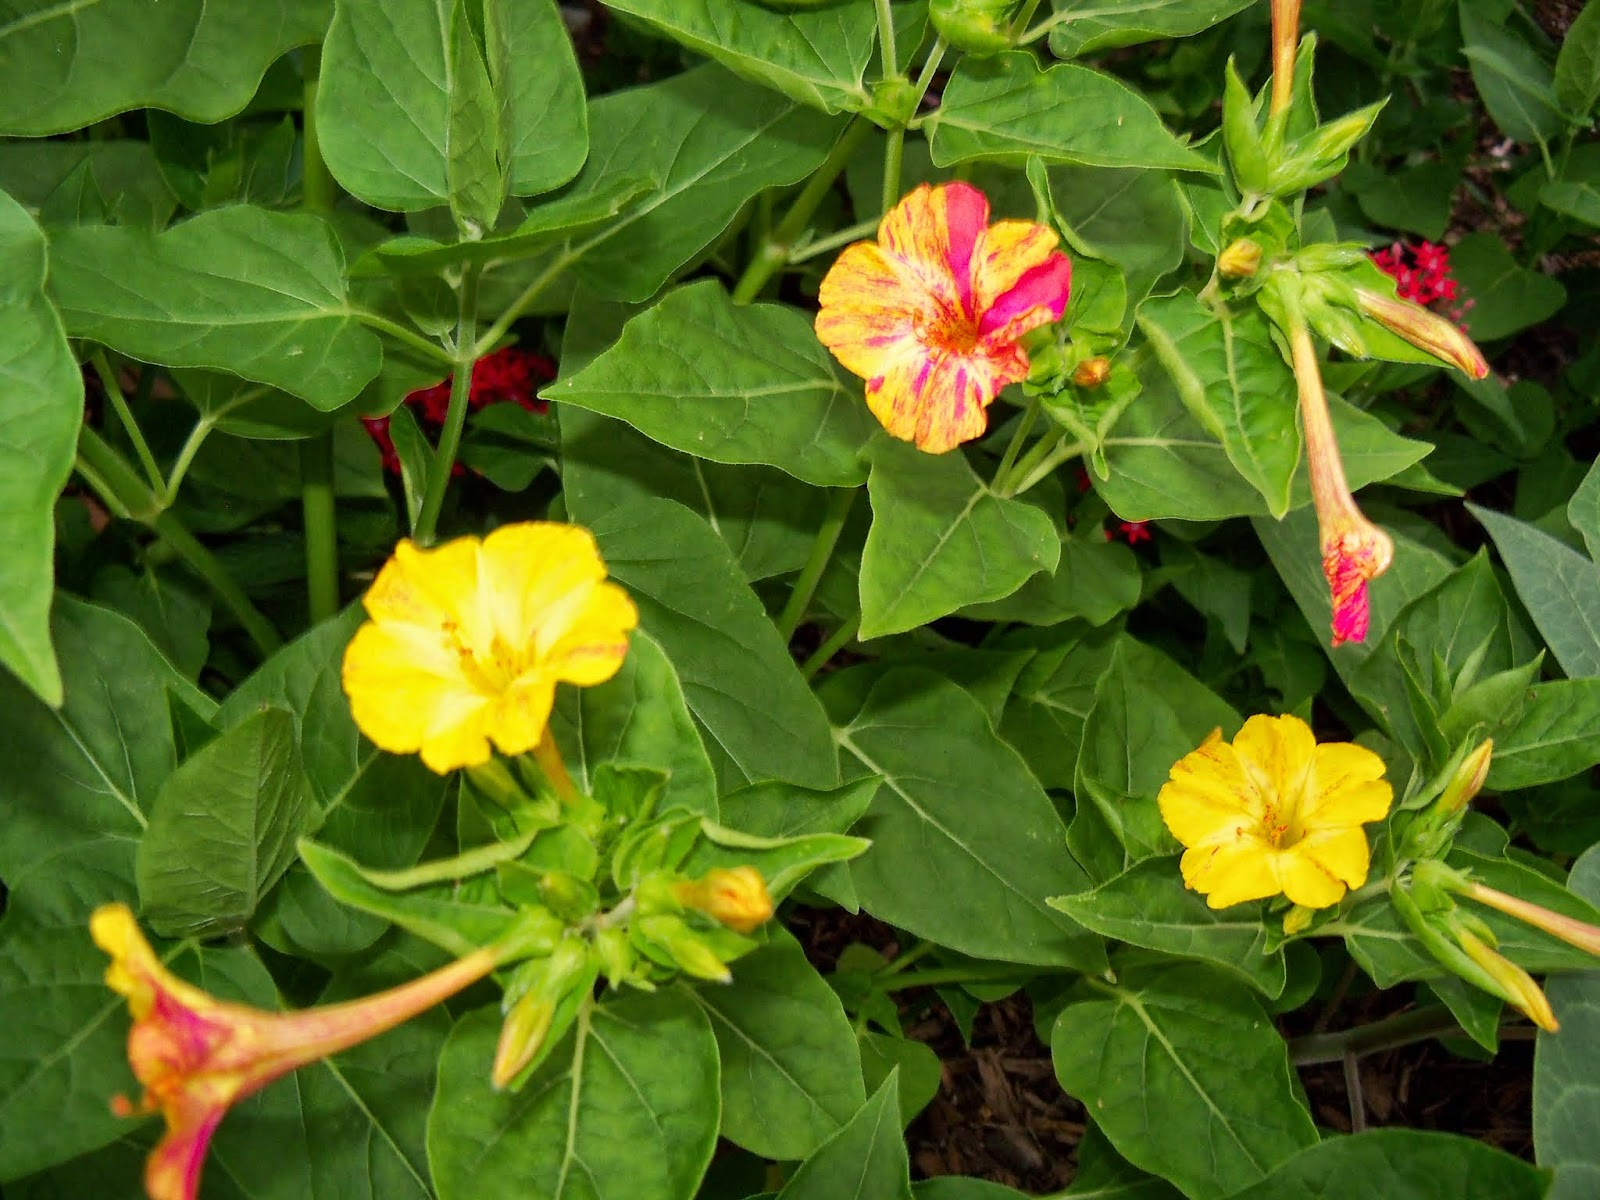 Gardening 2014 - 116_1956.JPG